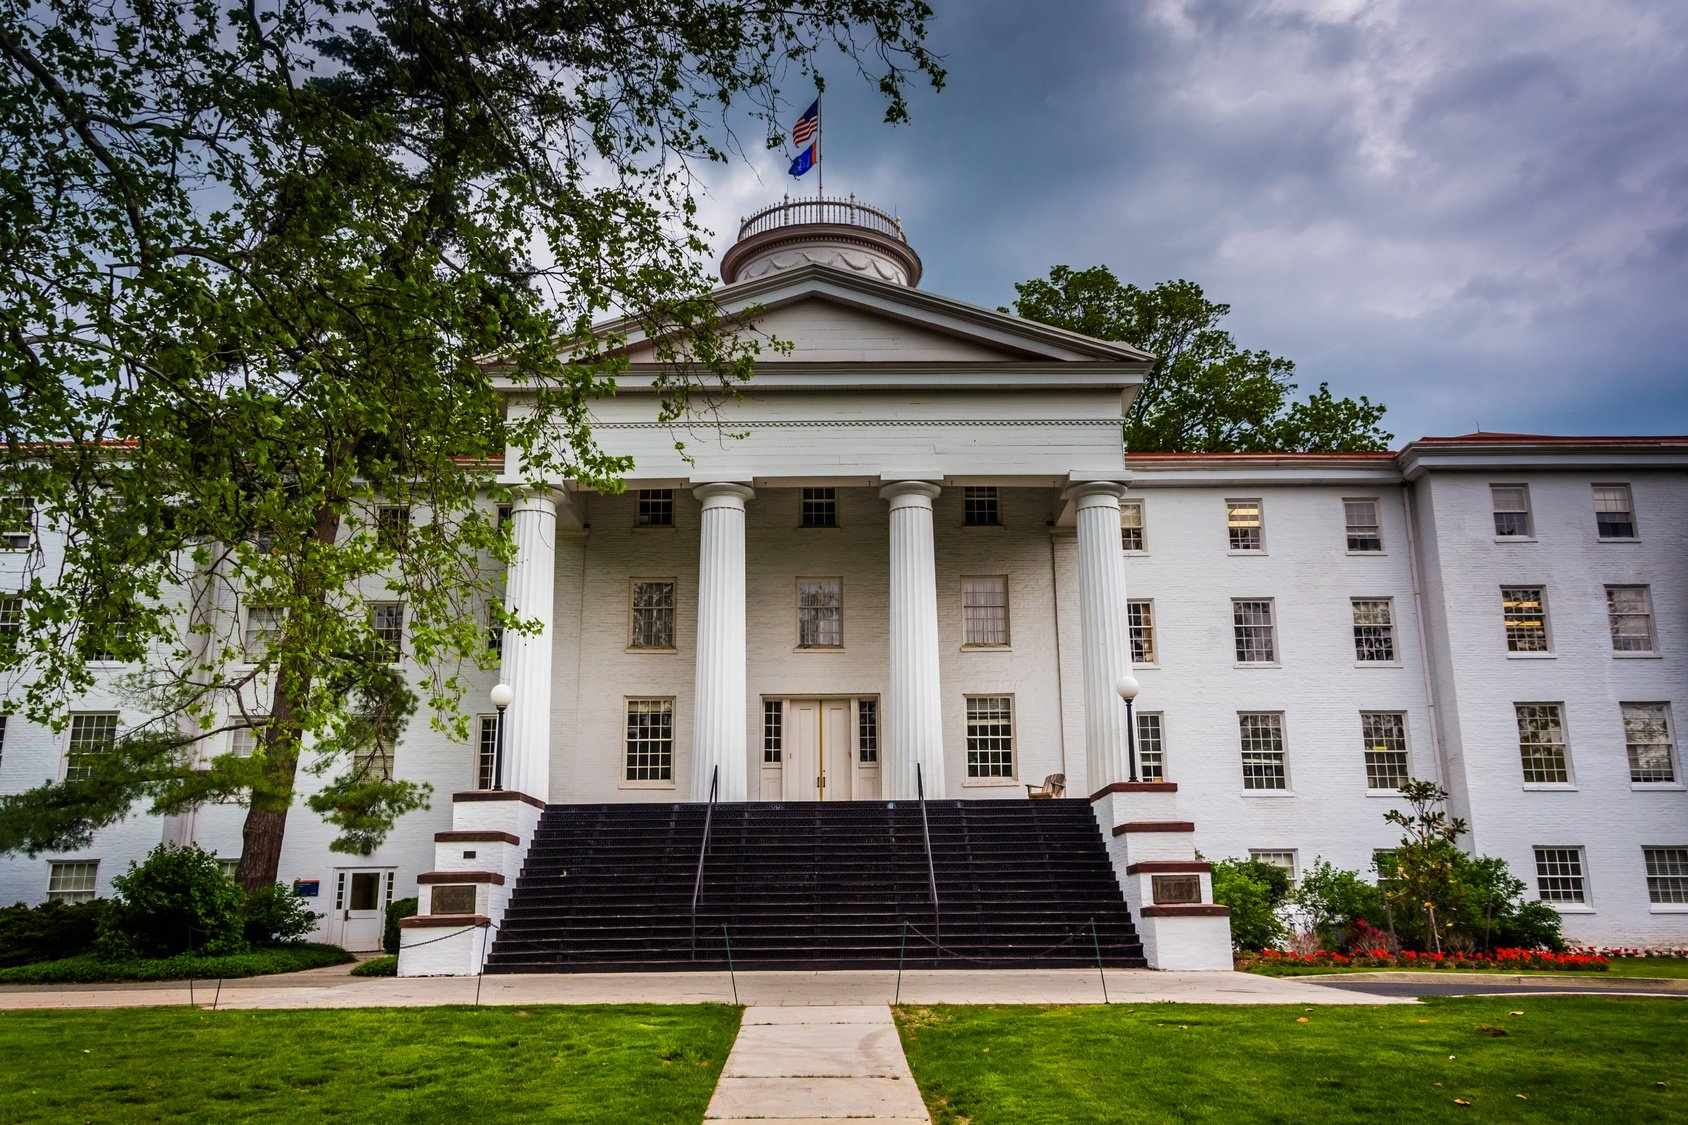 Pennsylvania Hall at Gettysburg College Haunted